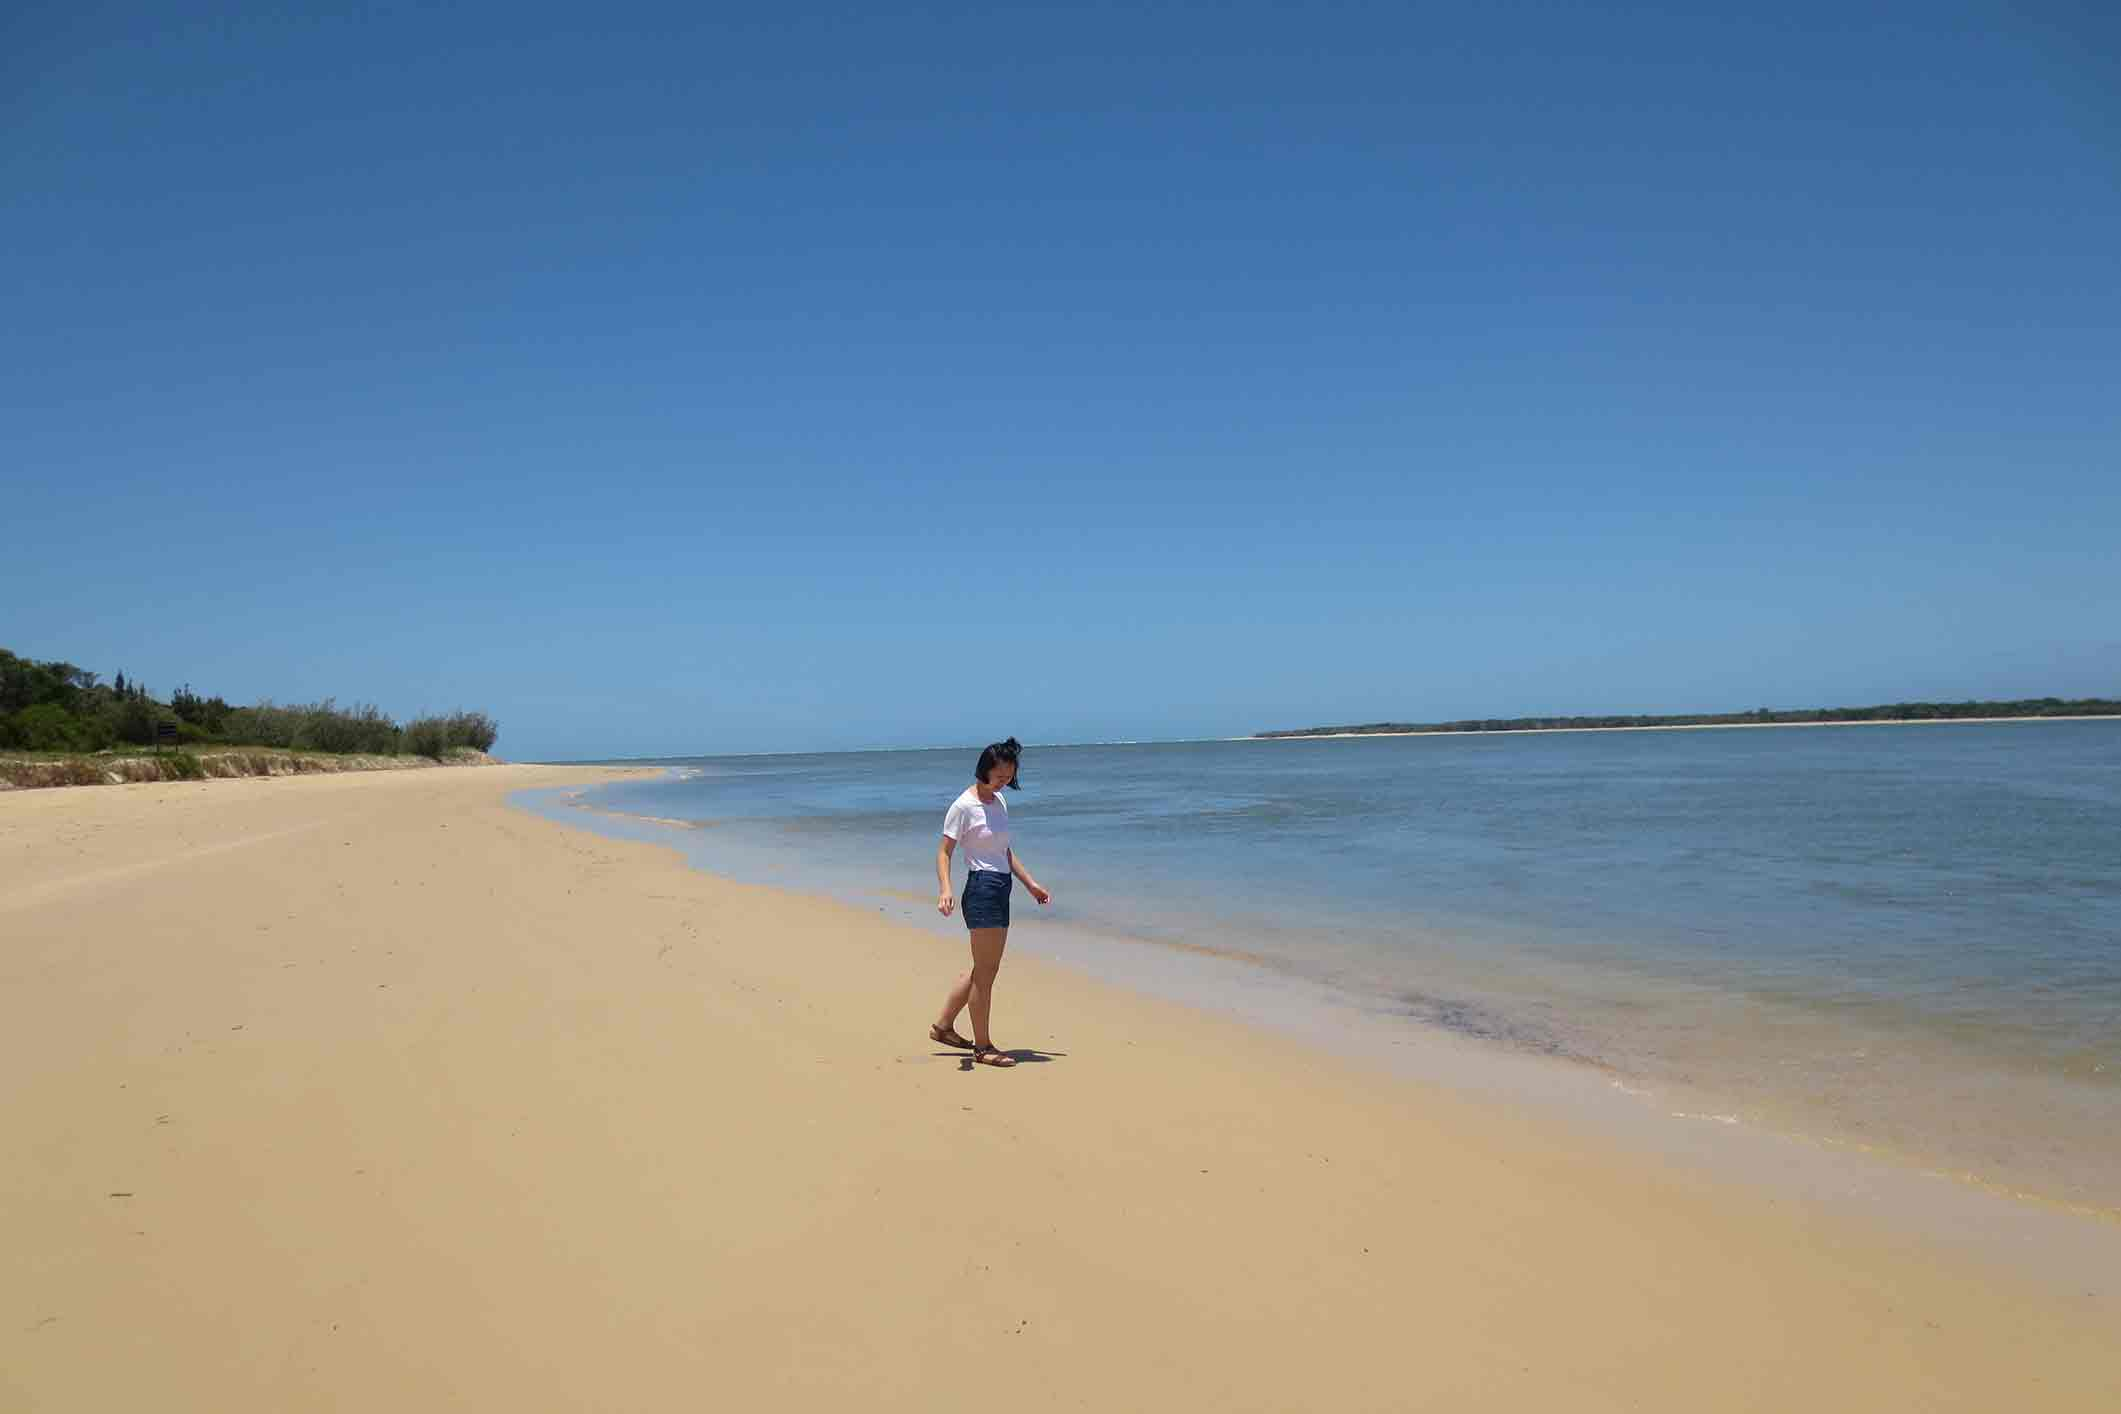 Waresa walking on the beach in Melbourne. Australia